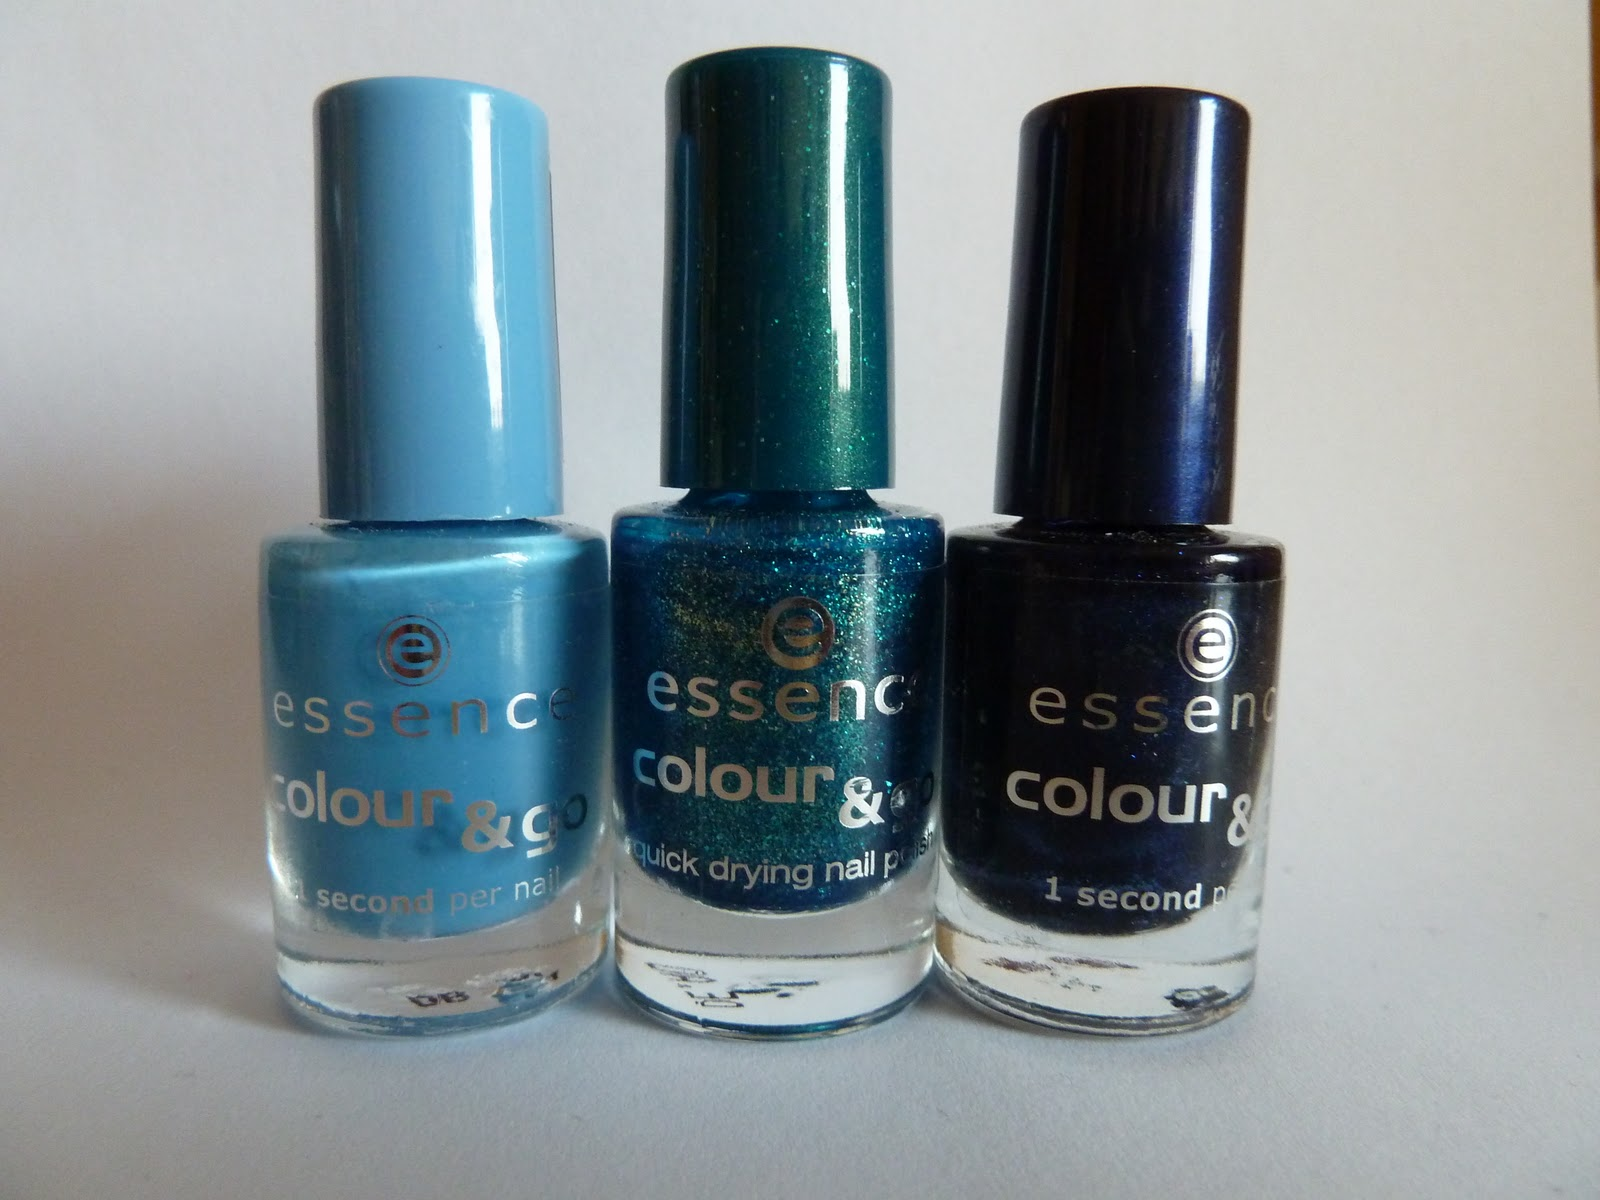 NailsByStephanie: My Essence Colour & Go Polishes Part I